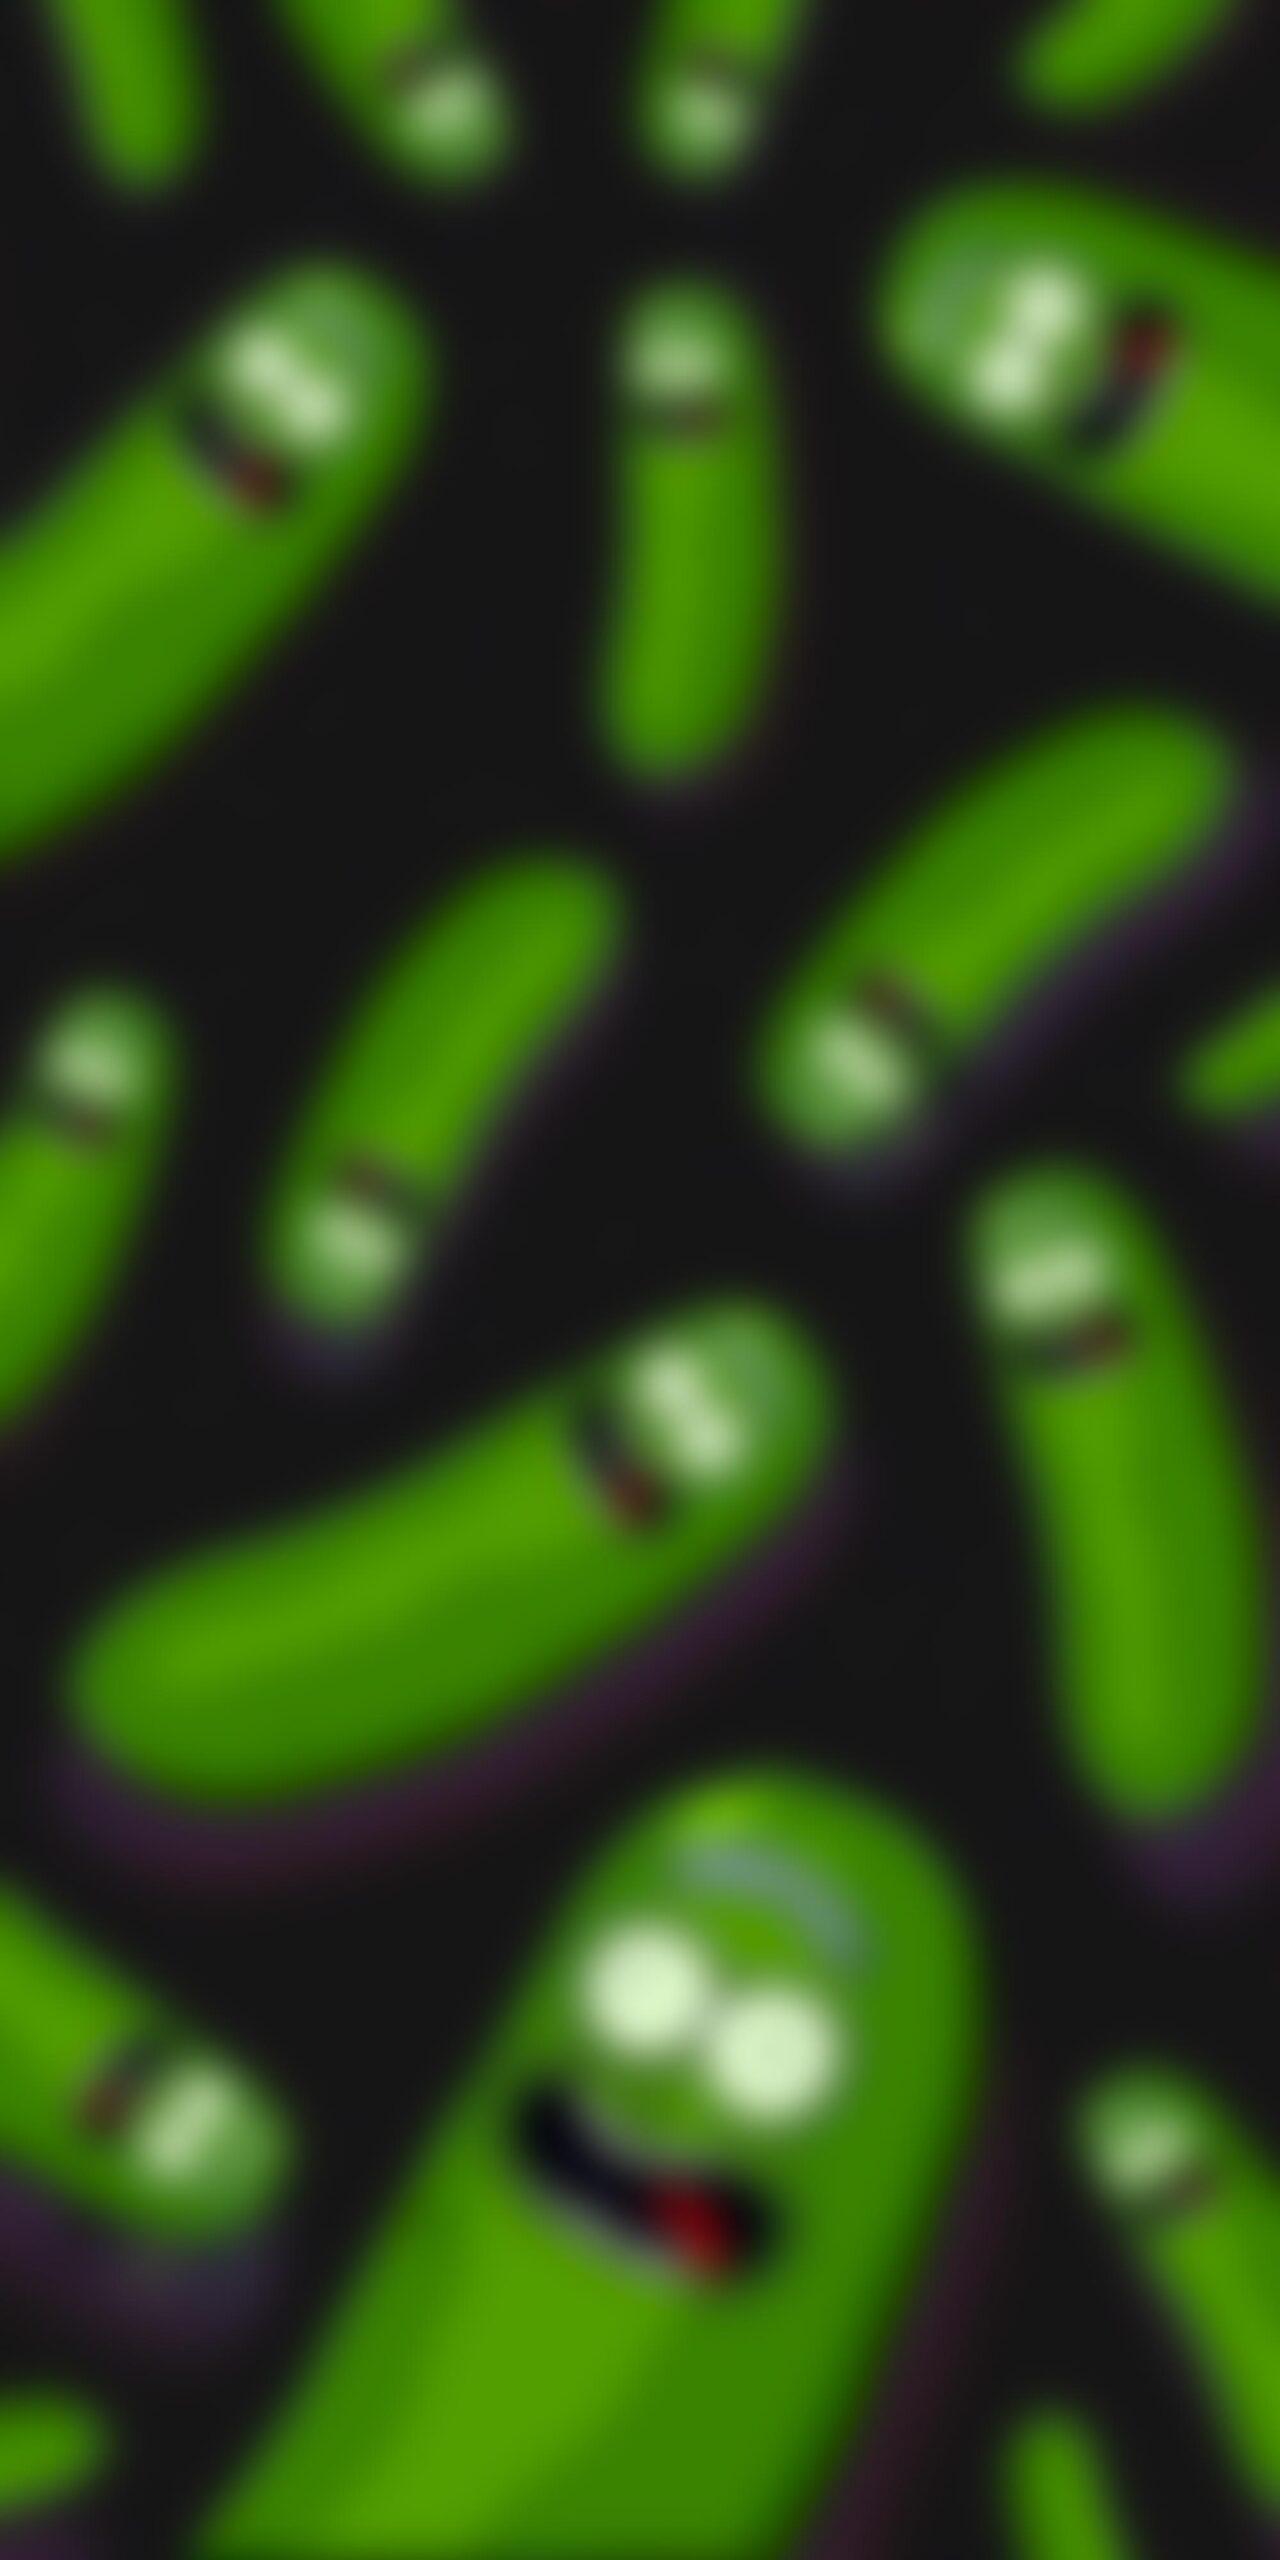 Pickle Rick Blur Phone Wallpaper